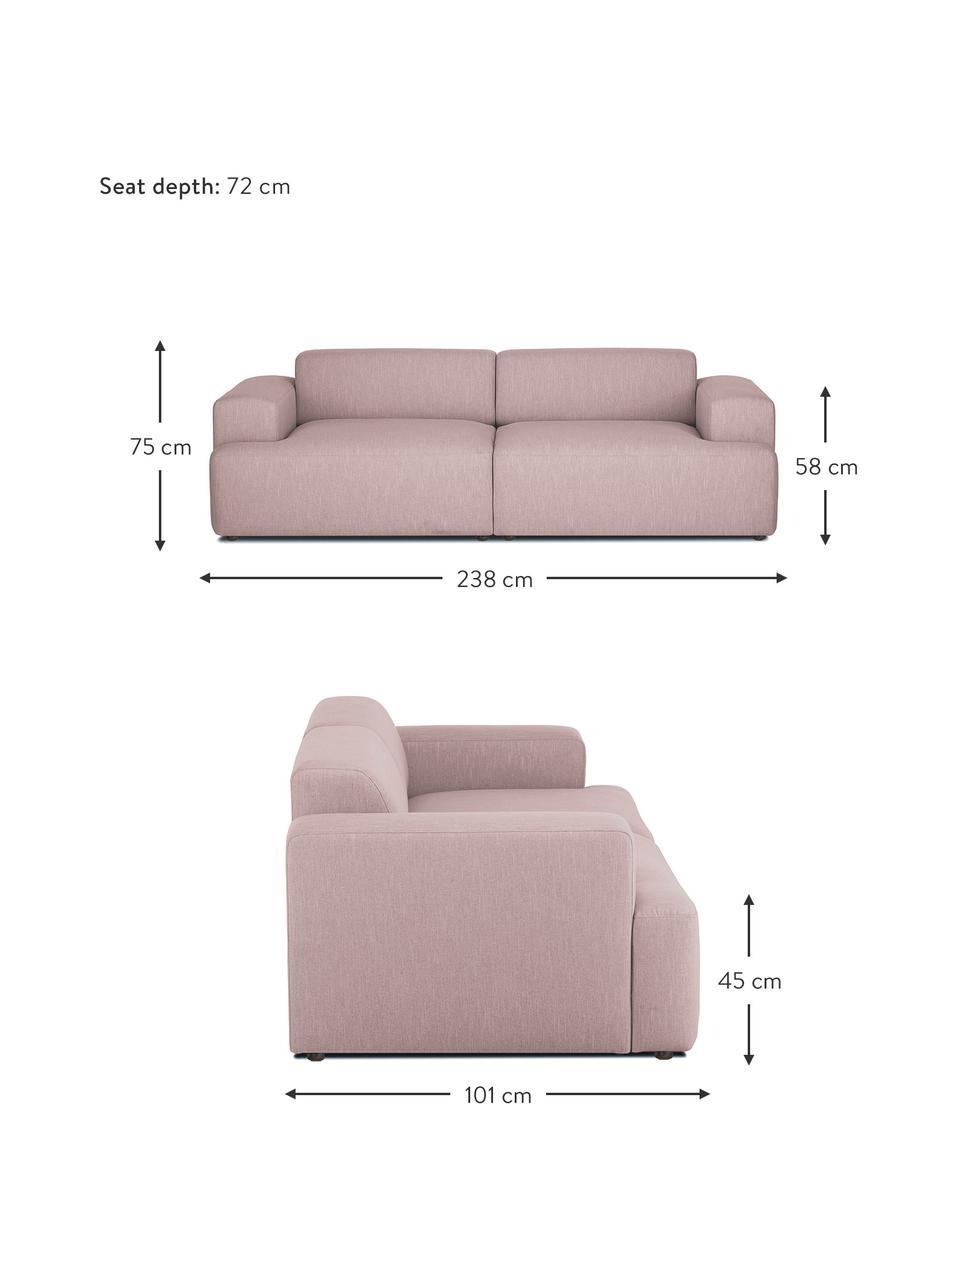 Sofa Melva (3-Sitzer) in Rosa, Bezug: 100% Polyester Der hochwe, Gestell: Massives Kiefernholz, FSC, Füße: Kunststoff, Webstoff Rosa, B 238 x T 101 cm